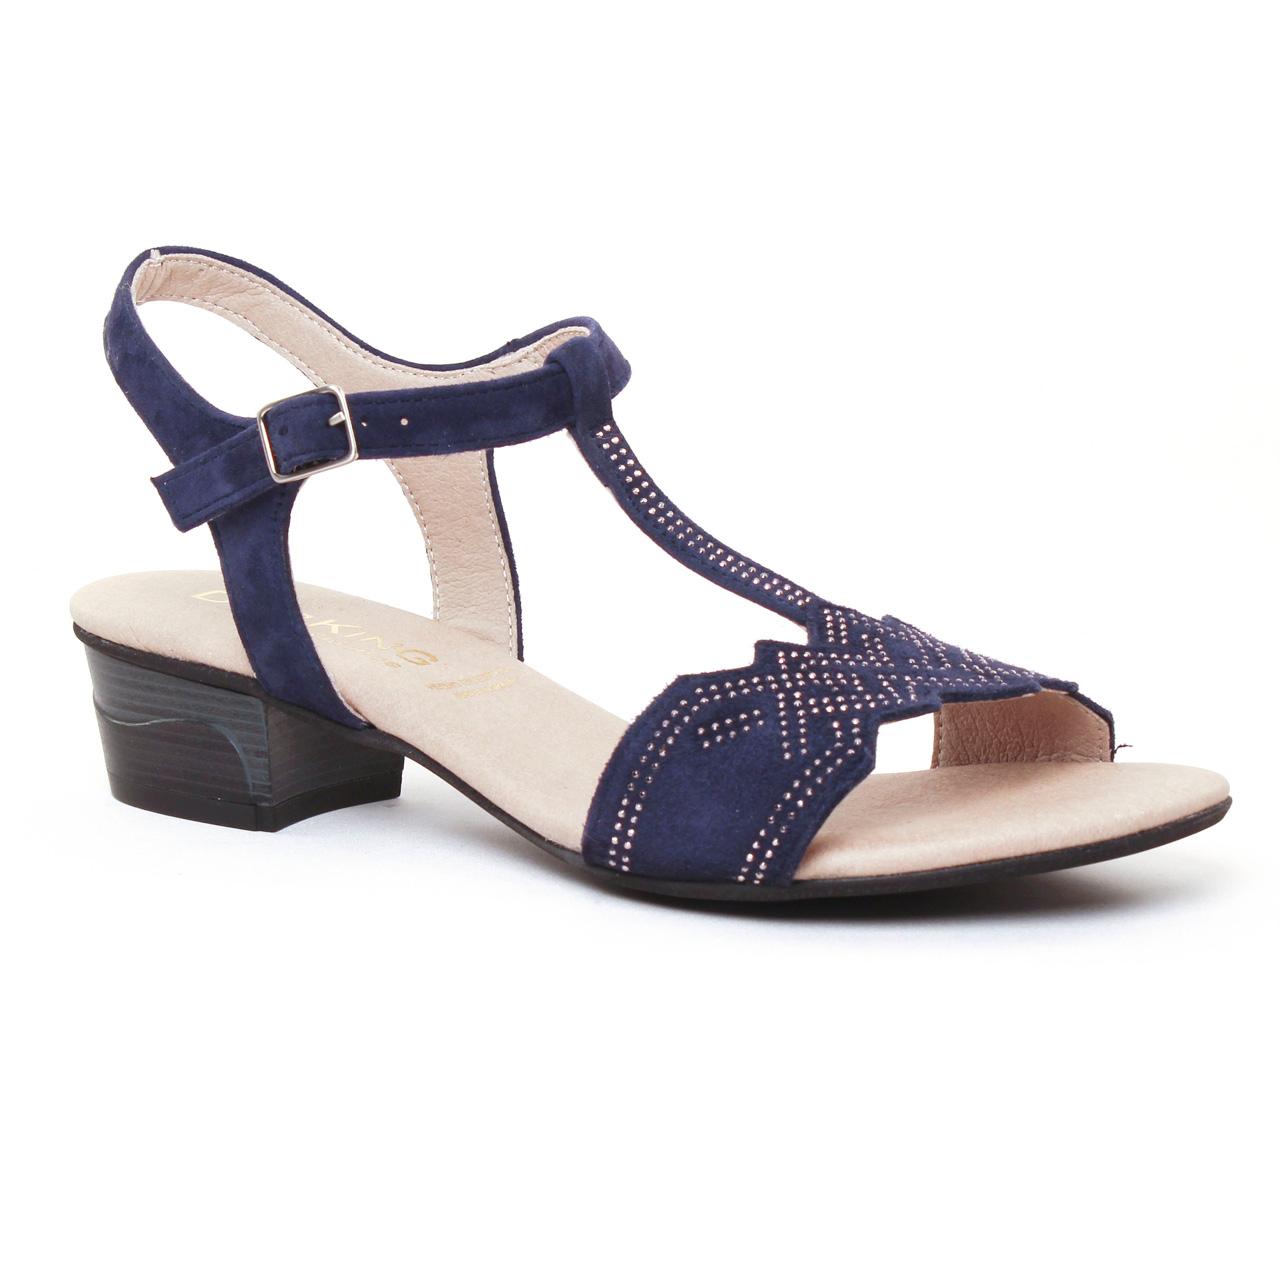 dorking olivia 7173 sandales bleu marine printemps t chez trois par 3. Black Bedroom Furniture Sets. Home Design Ideas